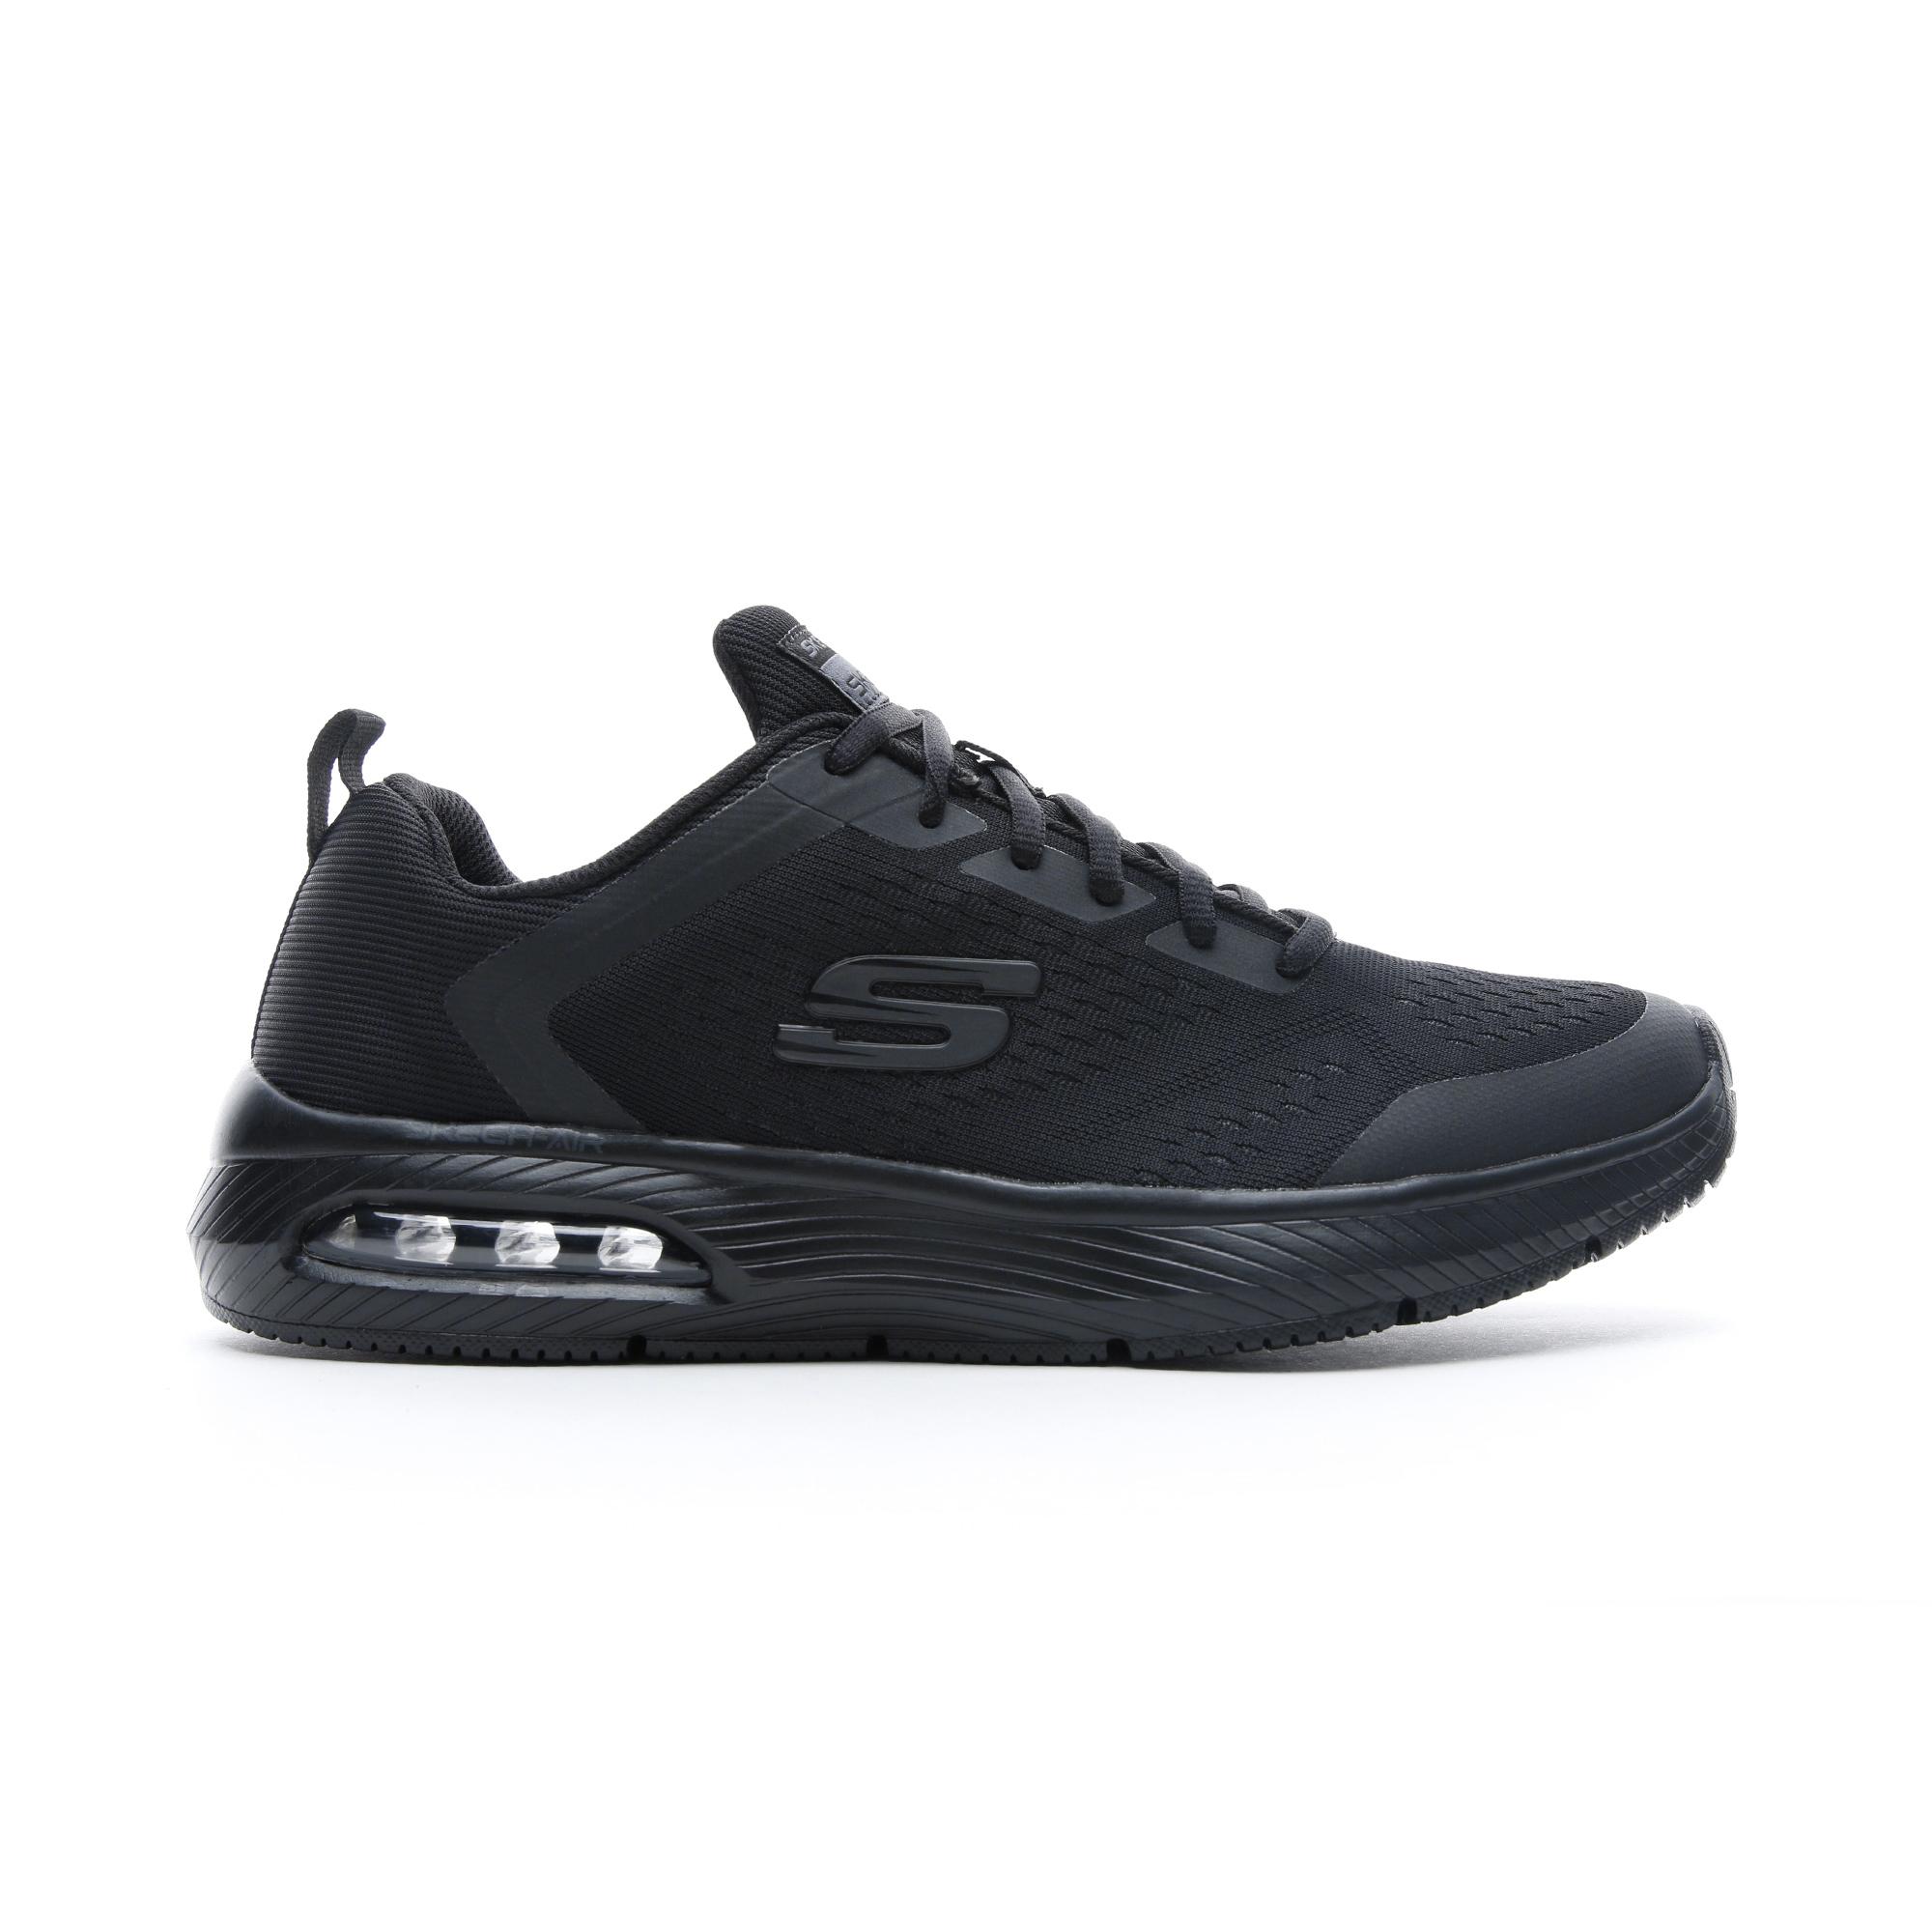 Skechers Dyna-Air - Pelland Erkek Siyah Spor Ayakkabı